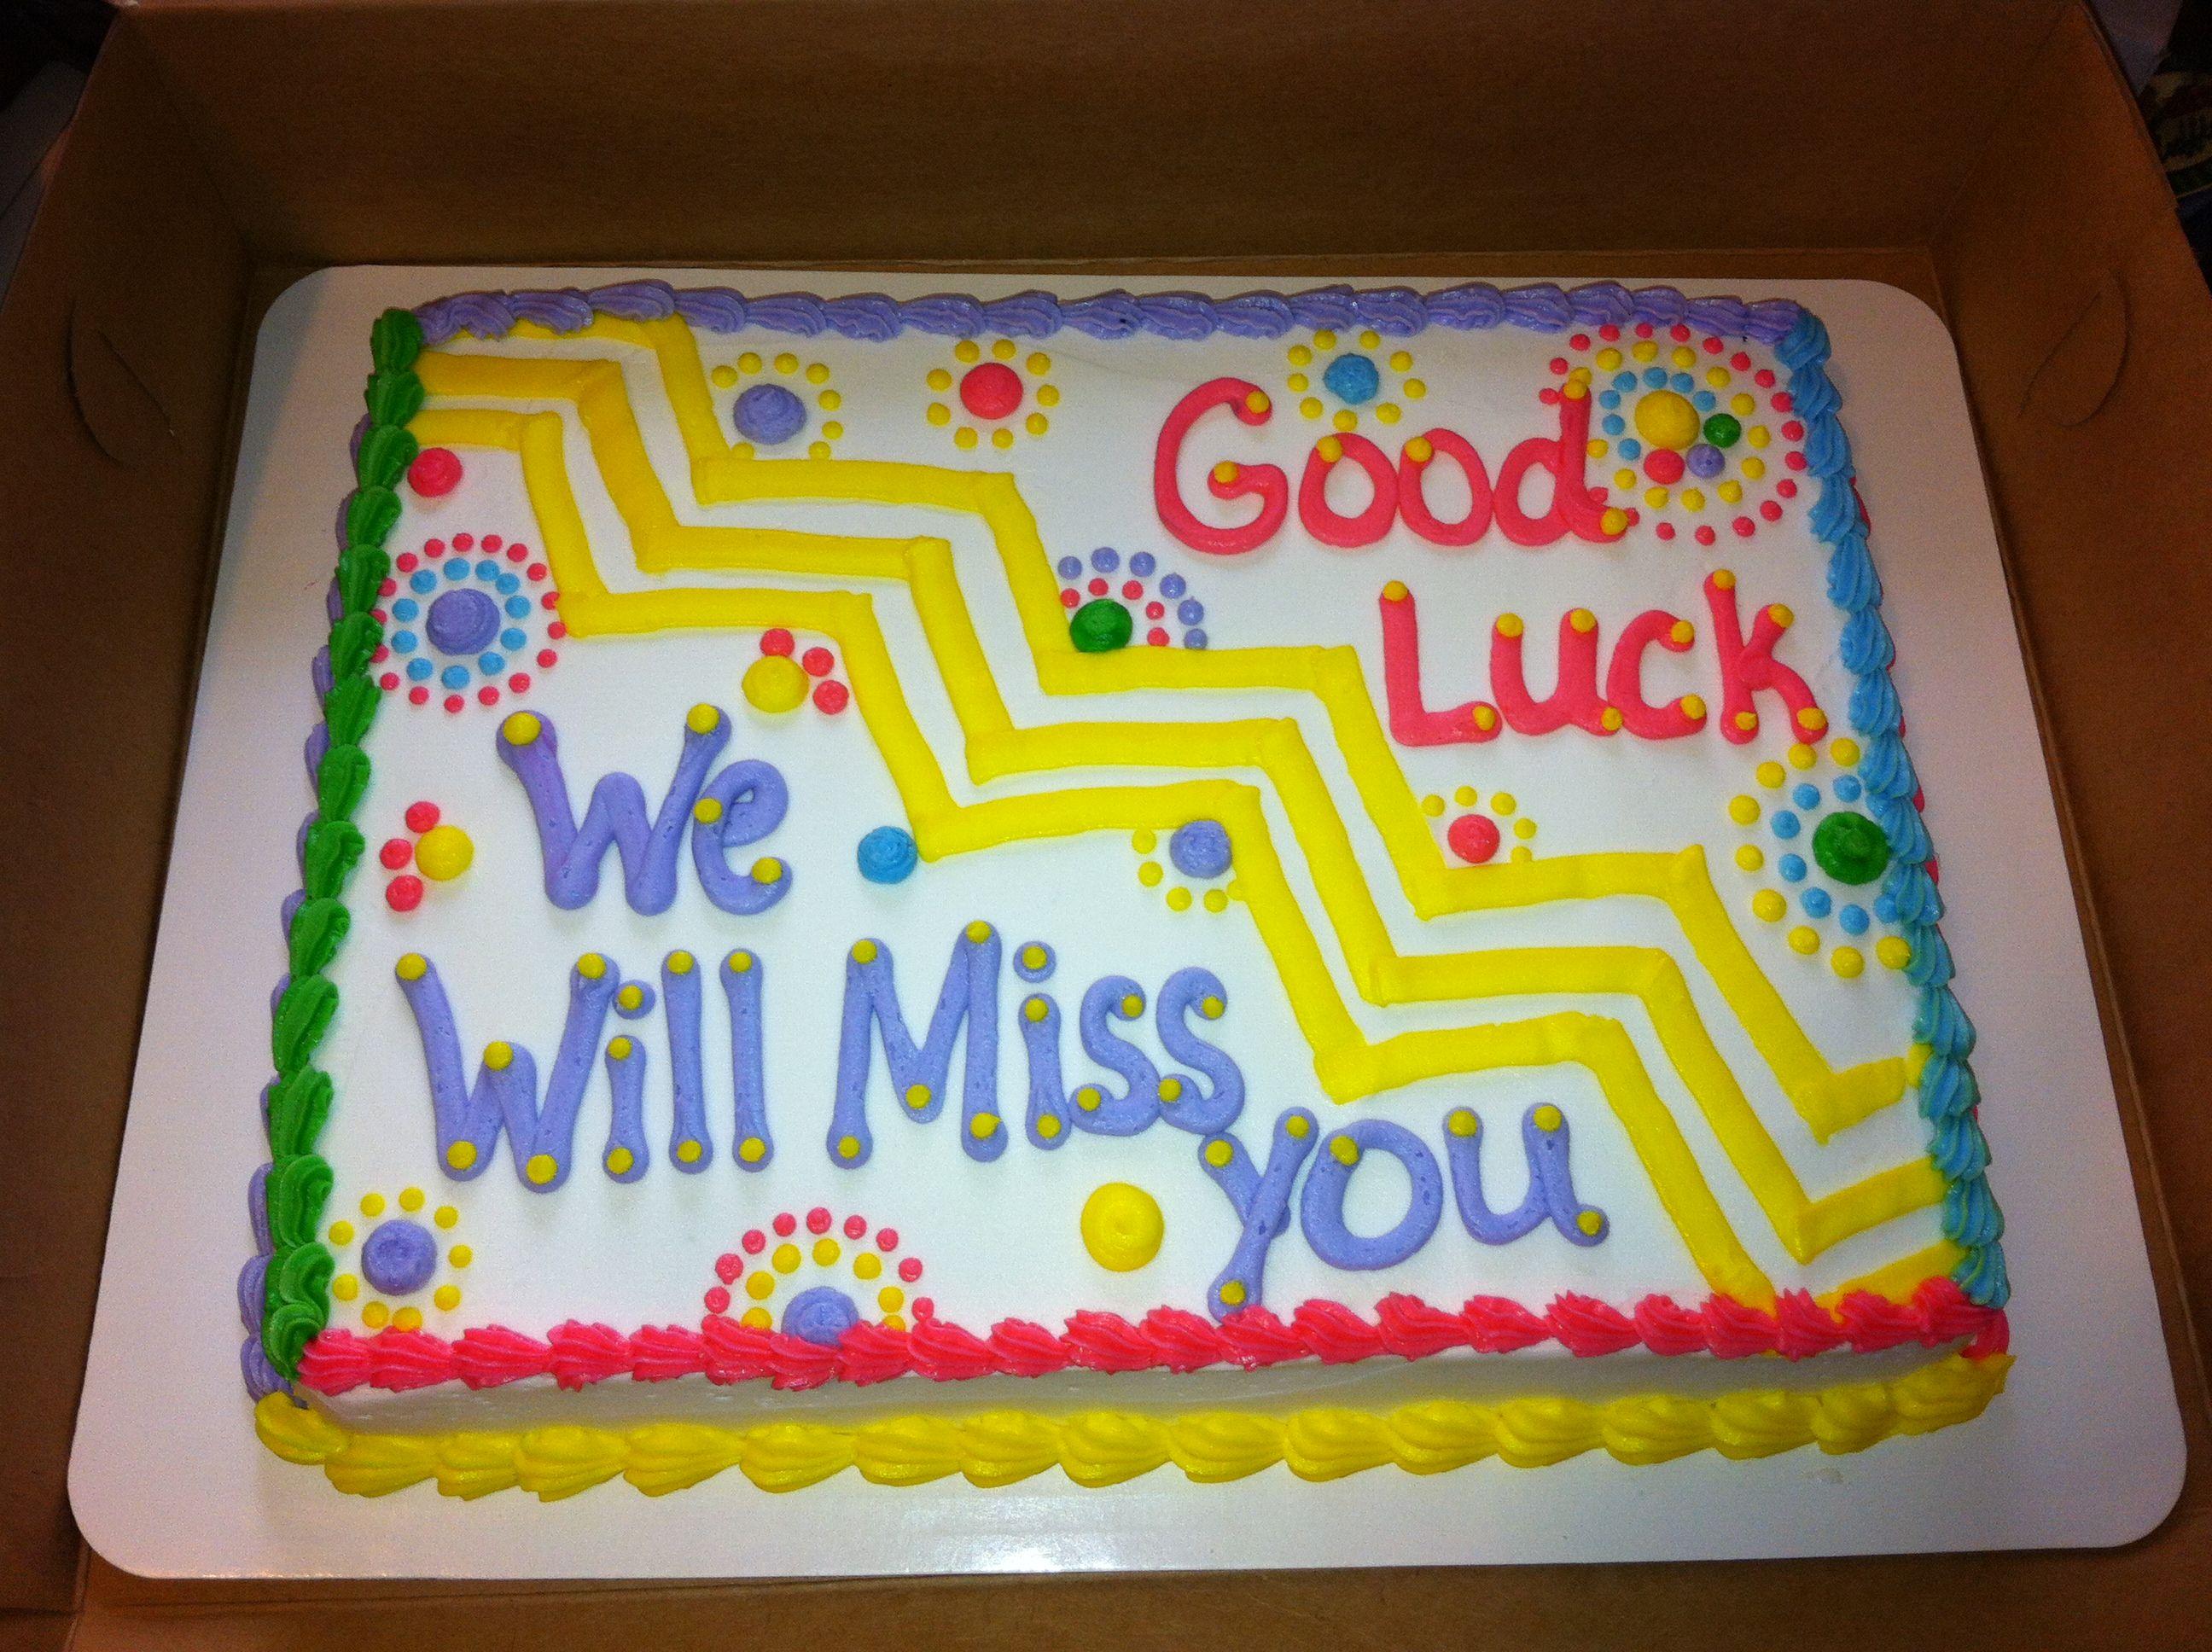 Farewell cake | My Cake Creations | Pinterest | Cake, Cake ...